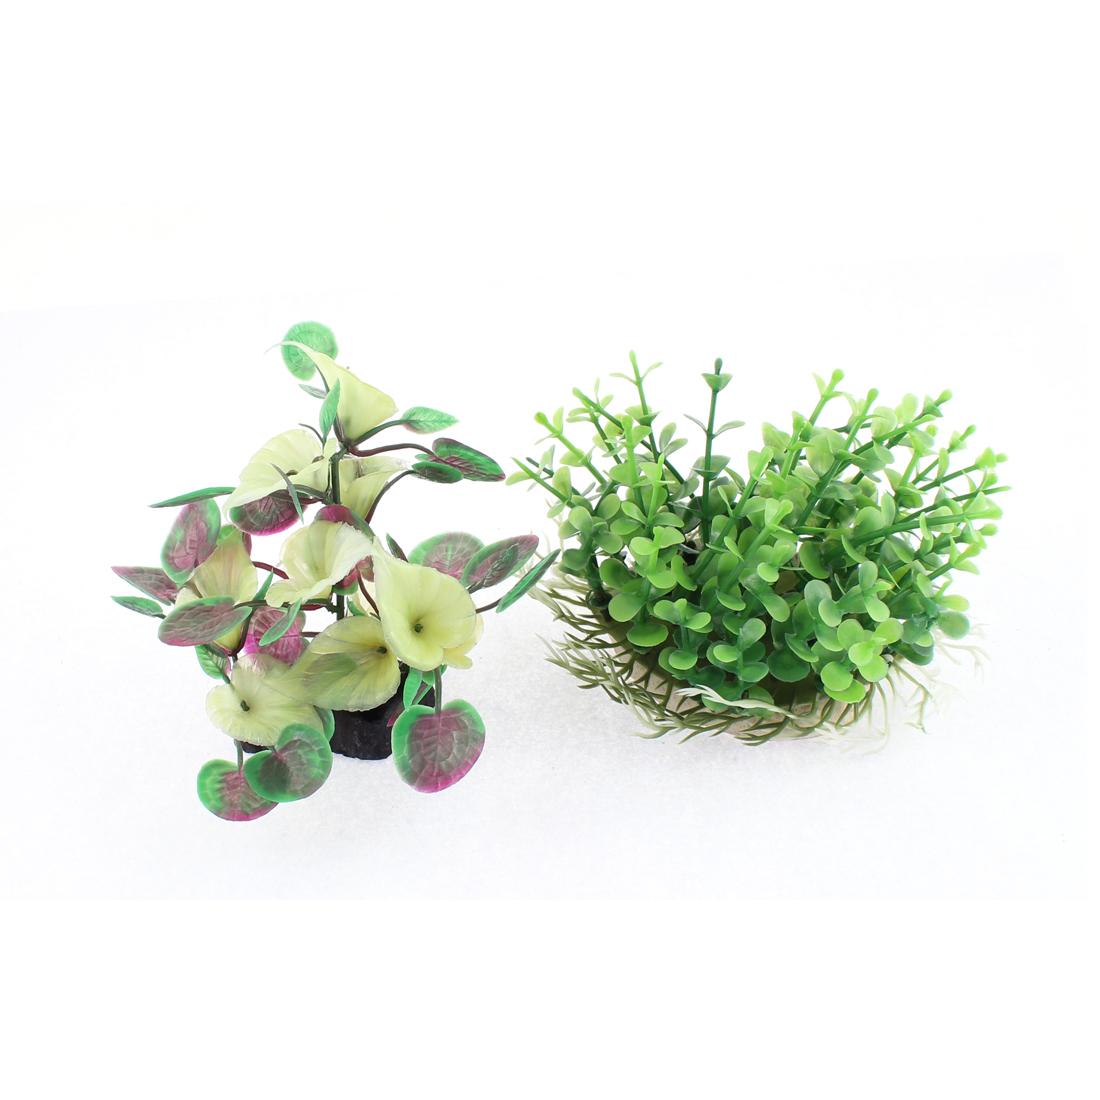 Aquarium Fishbowl Plastic Imitated Plant Grass Landscape Adornment 2 Pcs